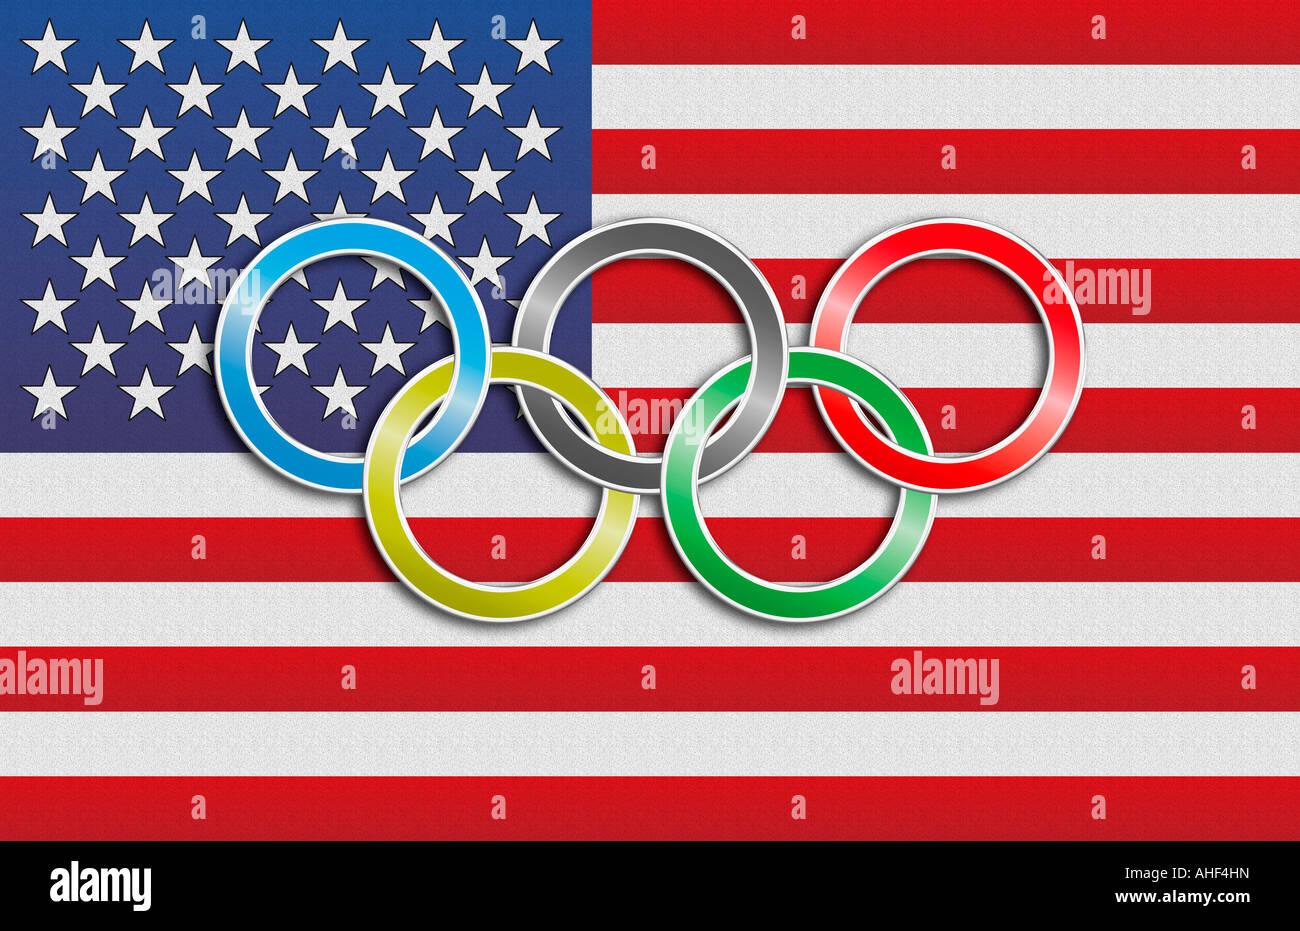 Flag Usa Olympic Rings Stock Photos Flag Usa Olympic Rings Stock